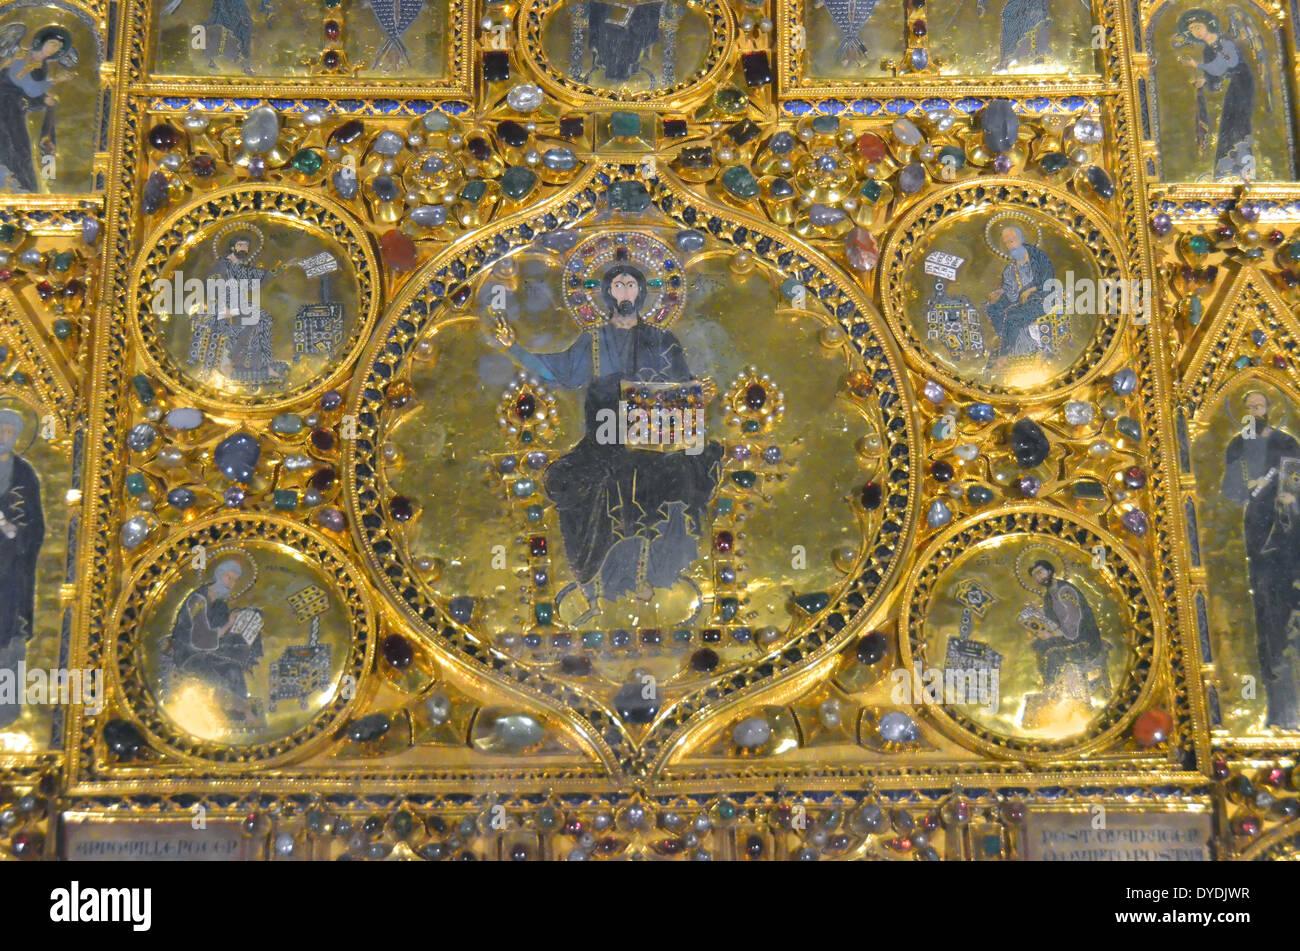 Treasure gold gems priceless pala d 39 oro art retable pala d for Pala de oro